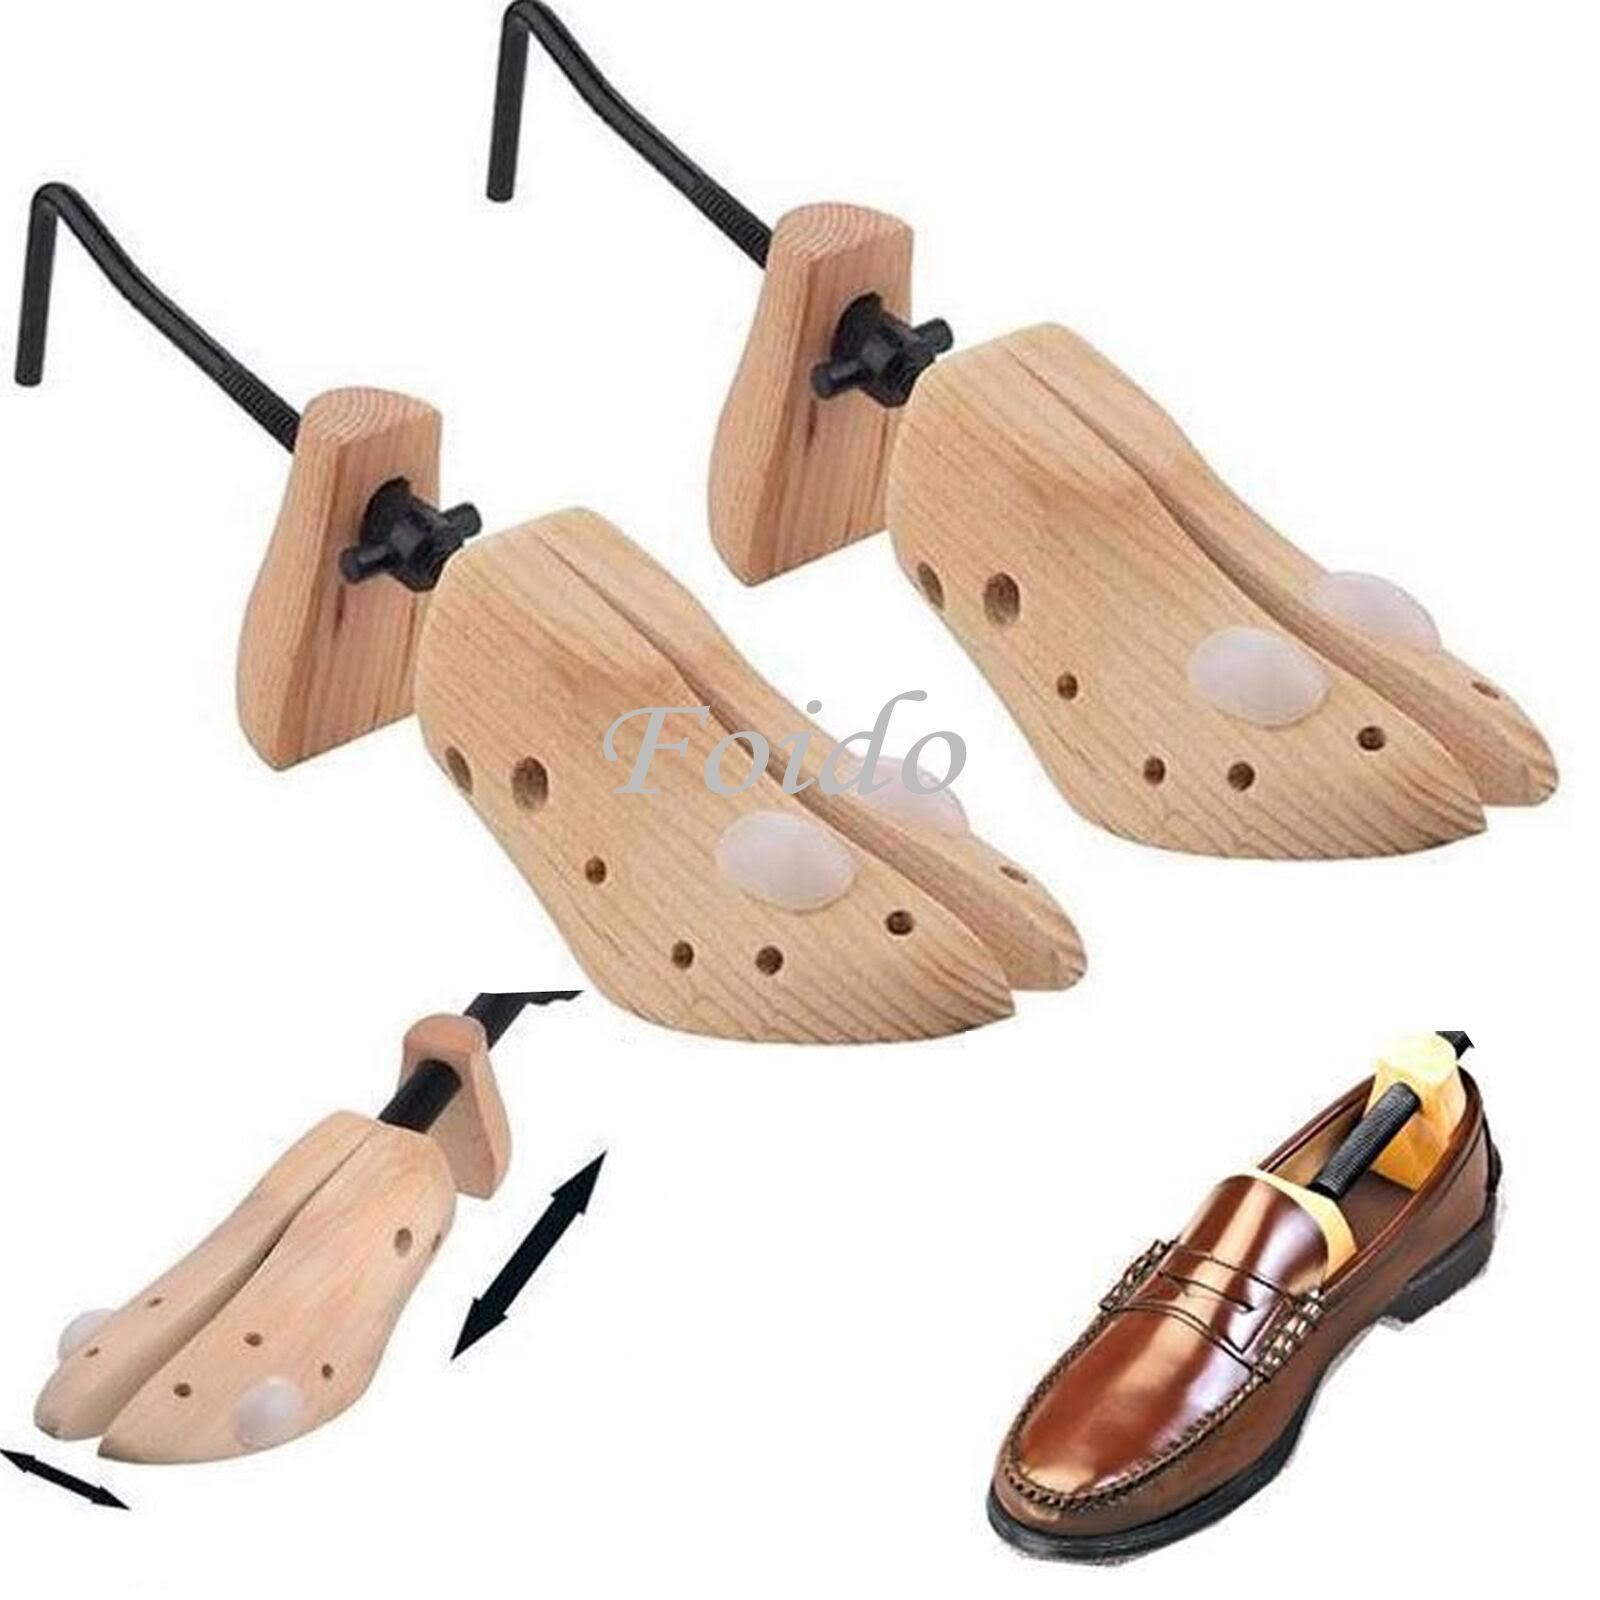 2 x Mens Gents Shoe Stretchers Tree Wooden Shaper Bunion Corn Blister Size 6-12